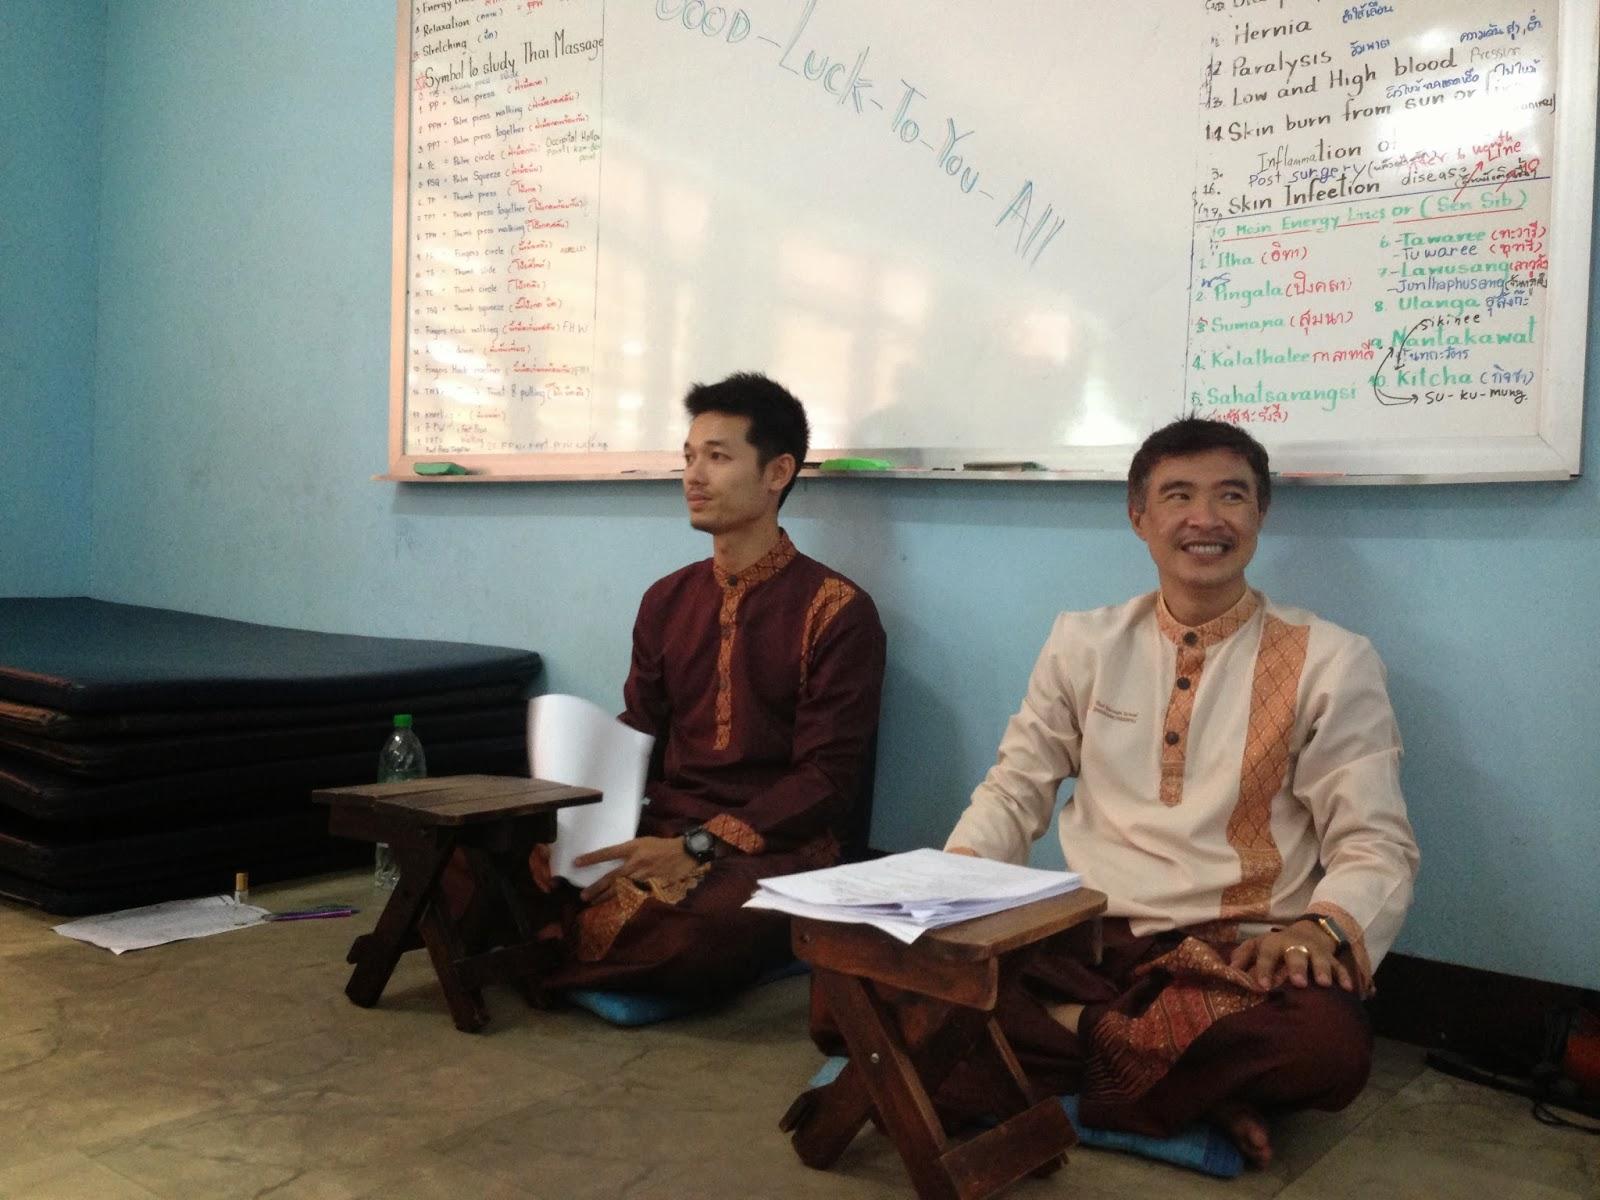 thai-massage-course-chiang-mai